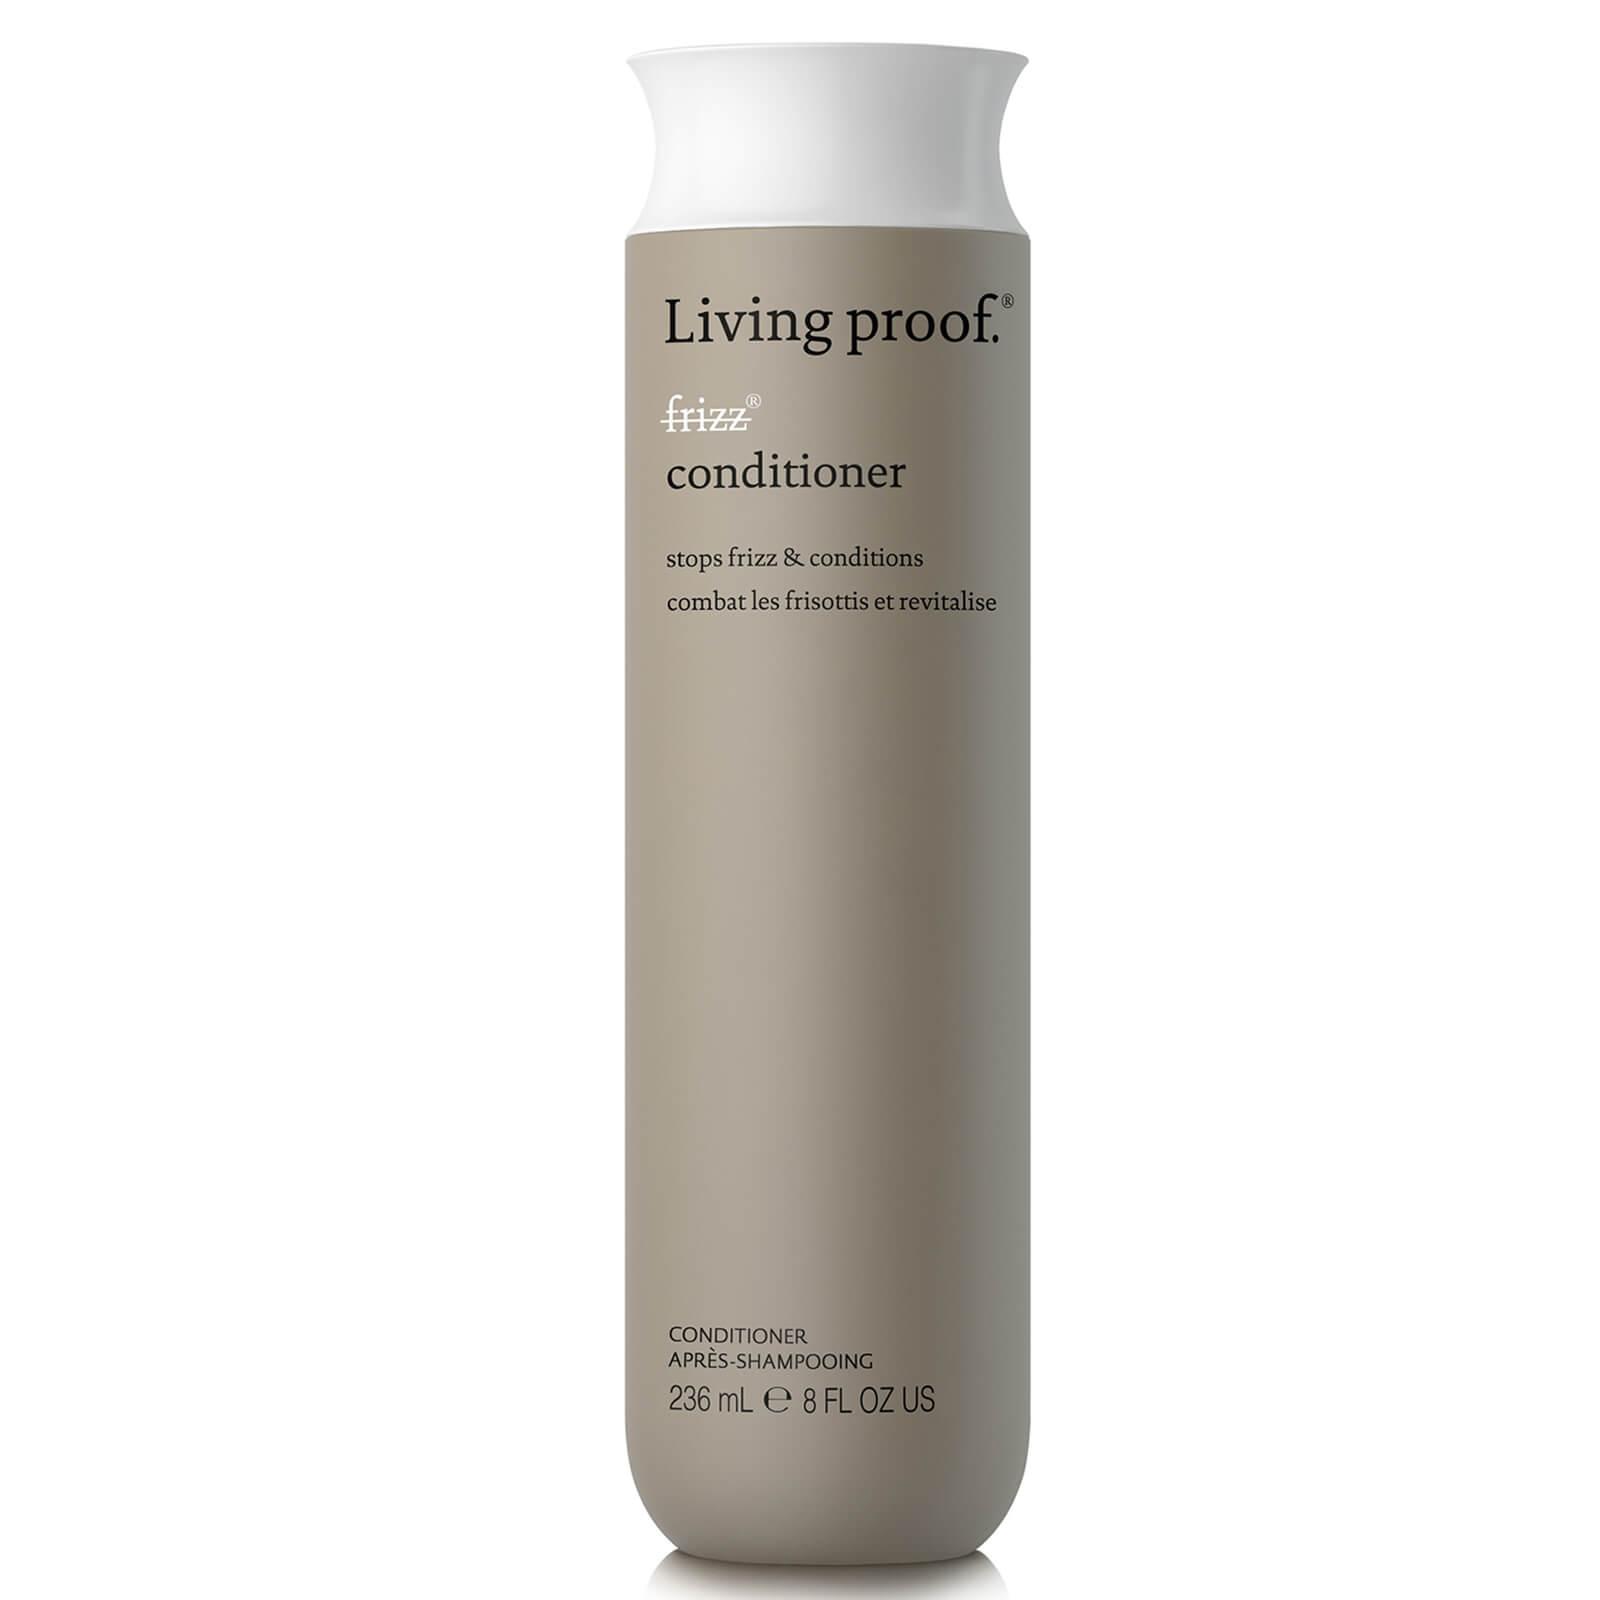 Living Proof Après-shampooing No Frizz Living Proof 236ml